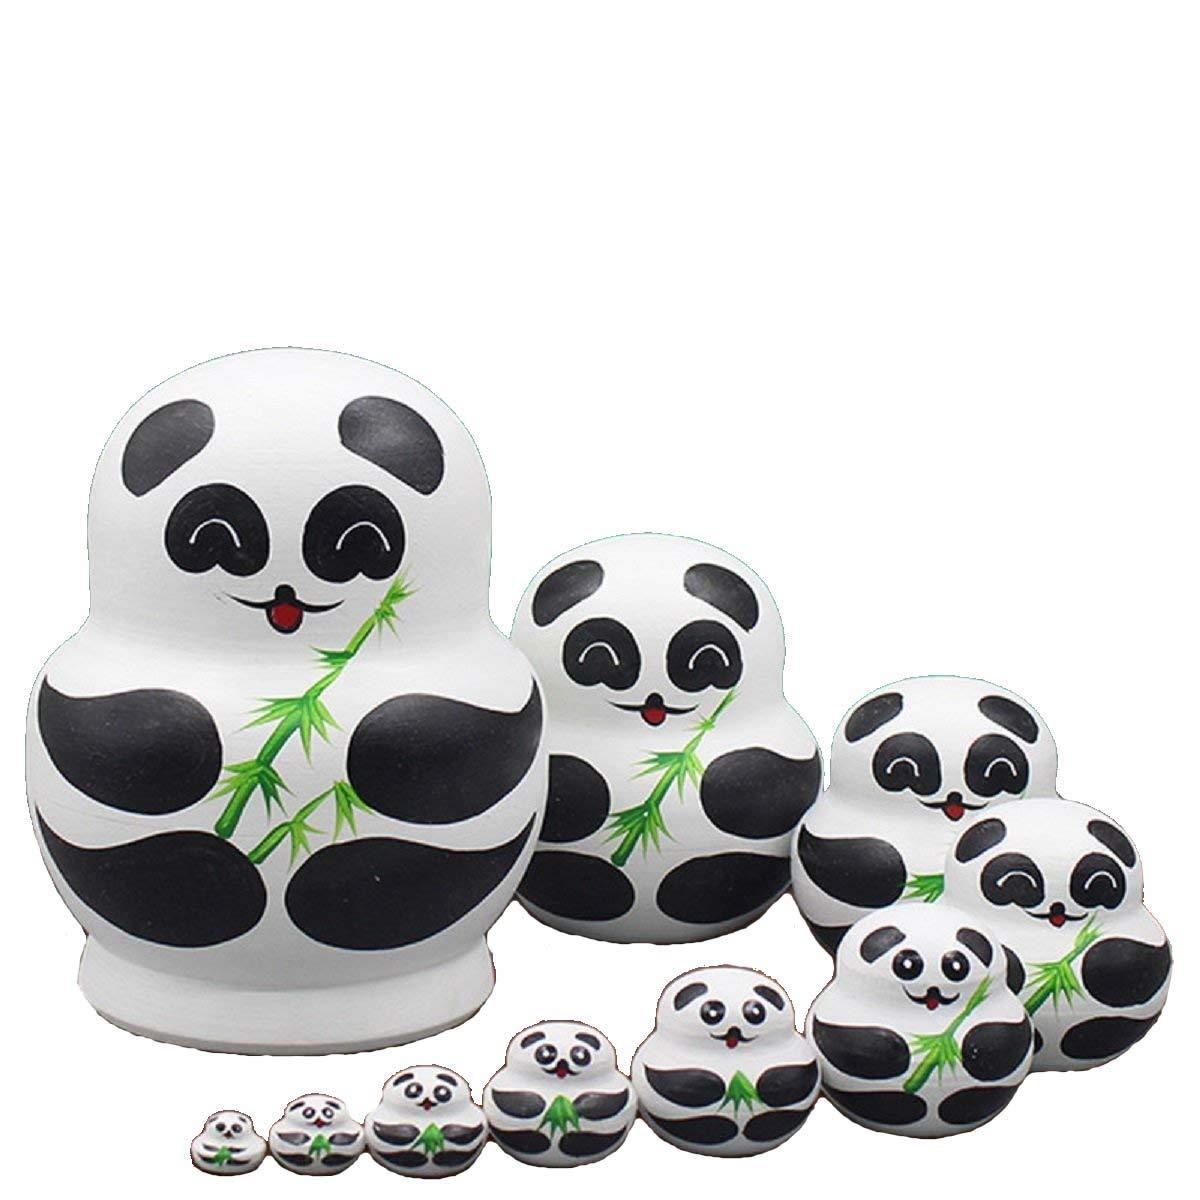 LK King&Light 10pcs Pandas Russian Nesting Dolls